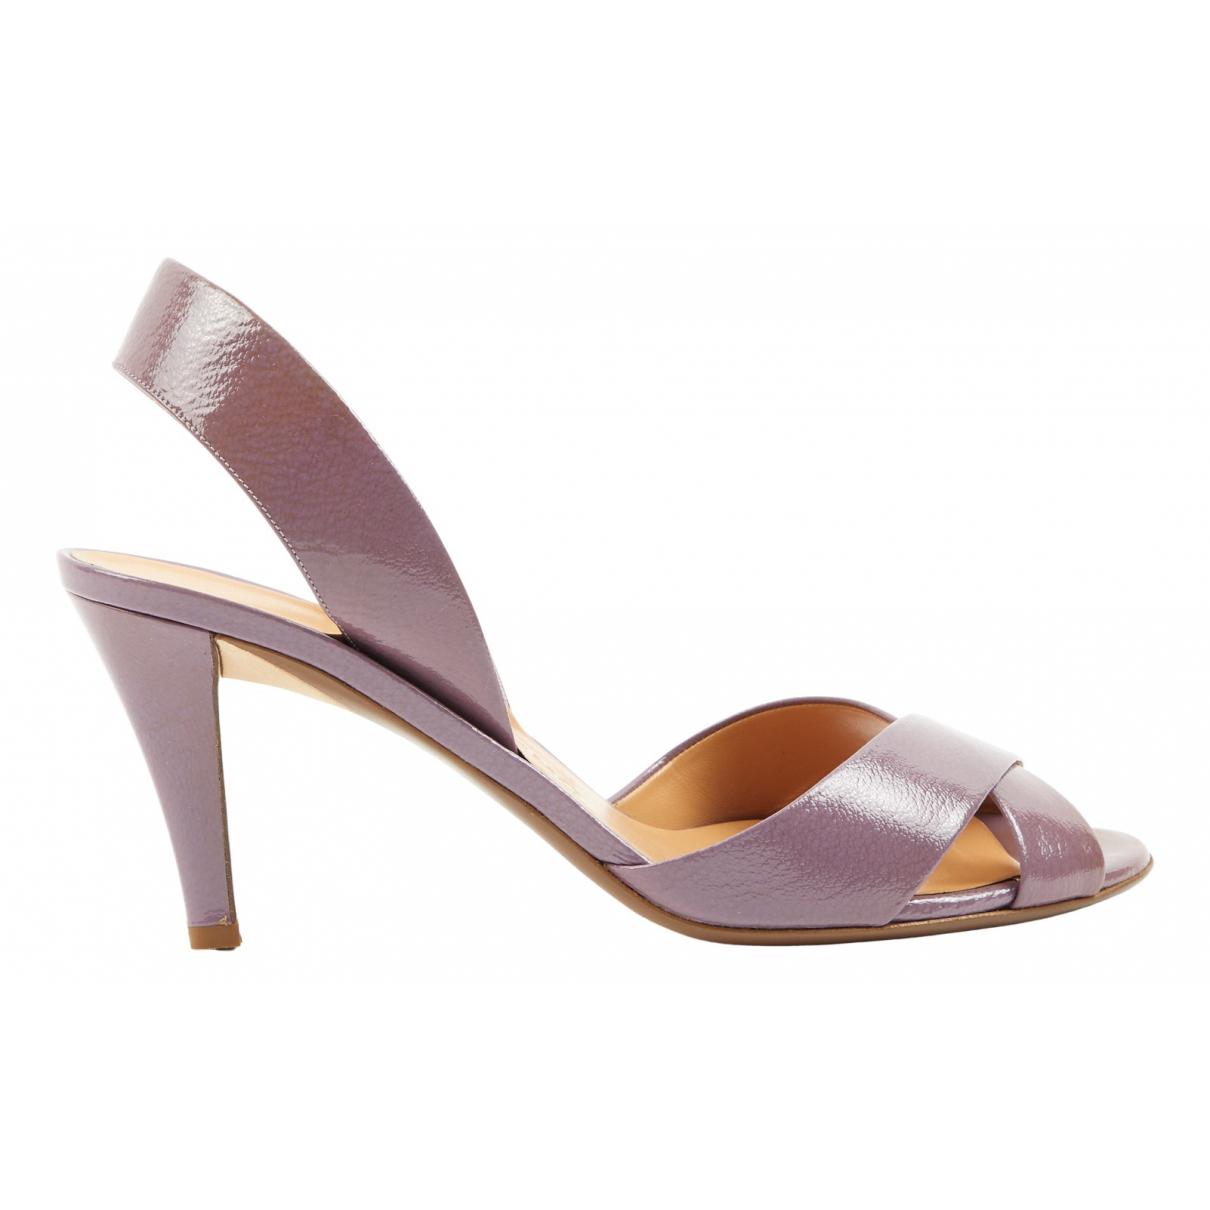 Salvatore Ferragamo N Purple Leather Sandals for Women 8.5 US